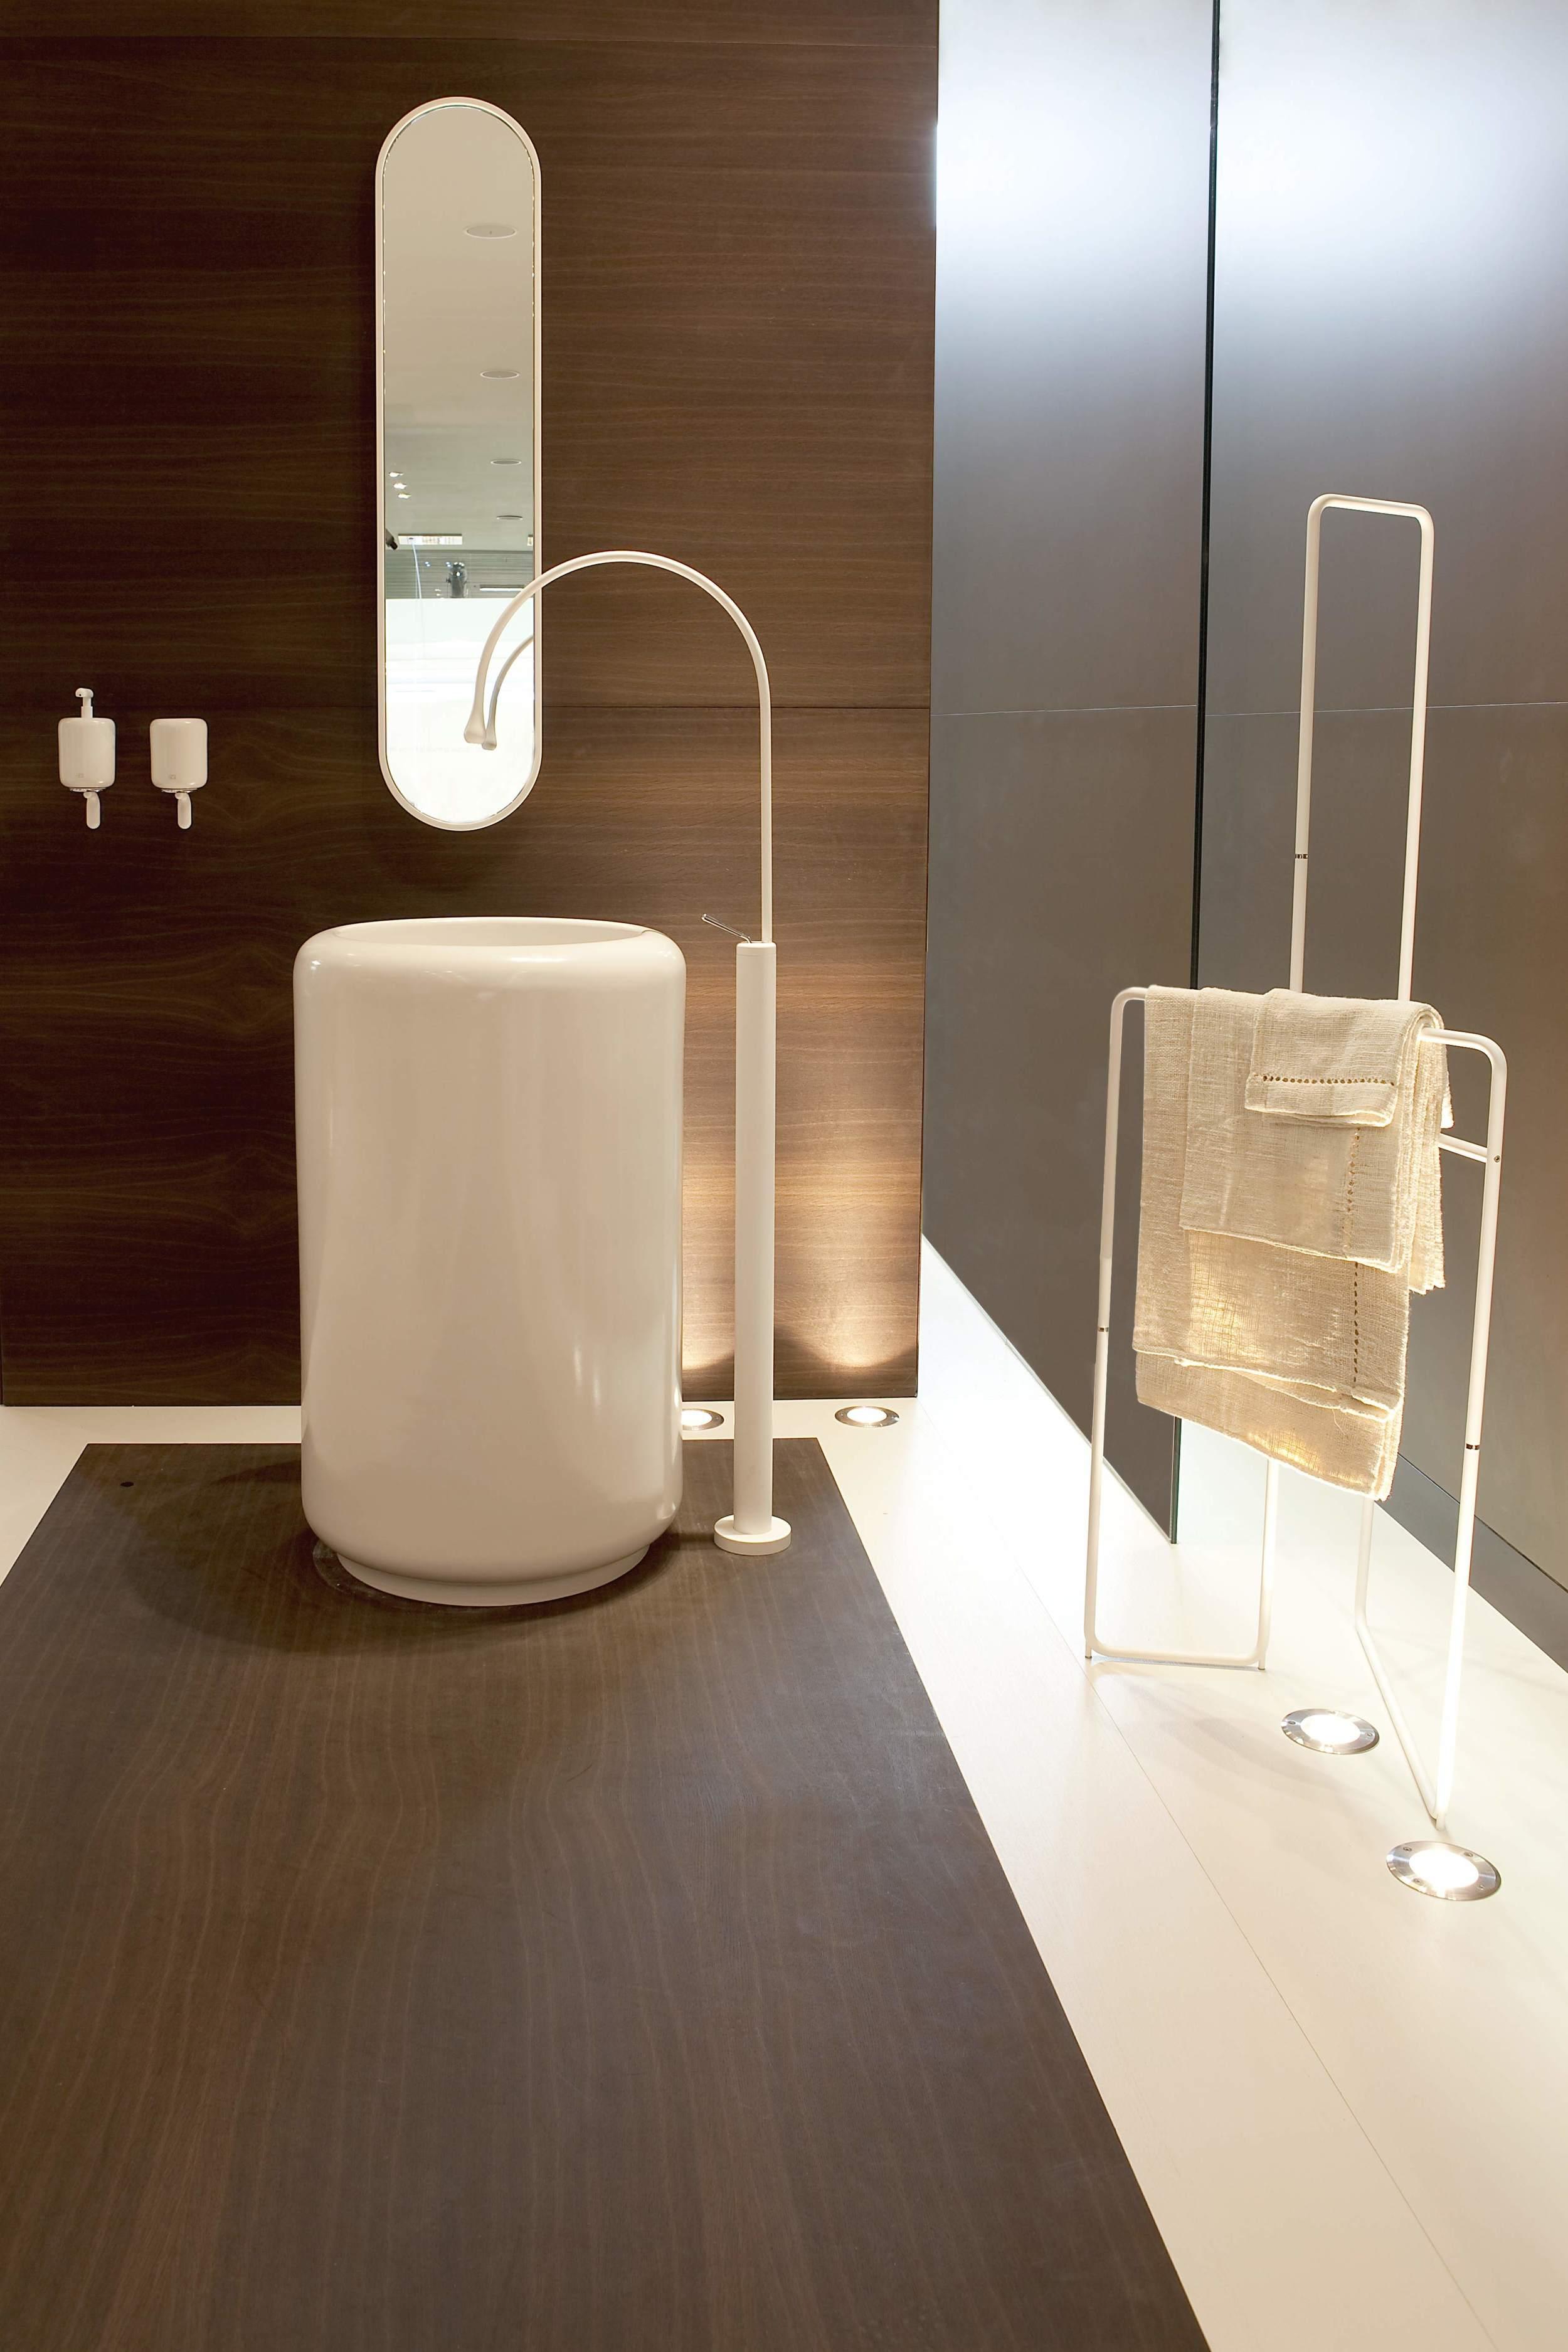 Gessi-Goccia-pedestal-sink.jpg